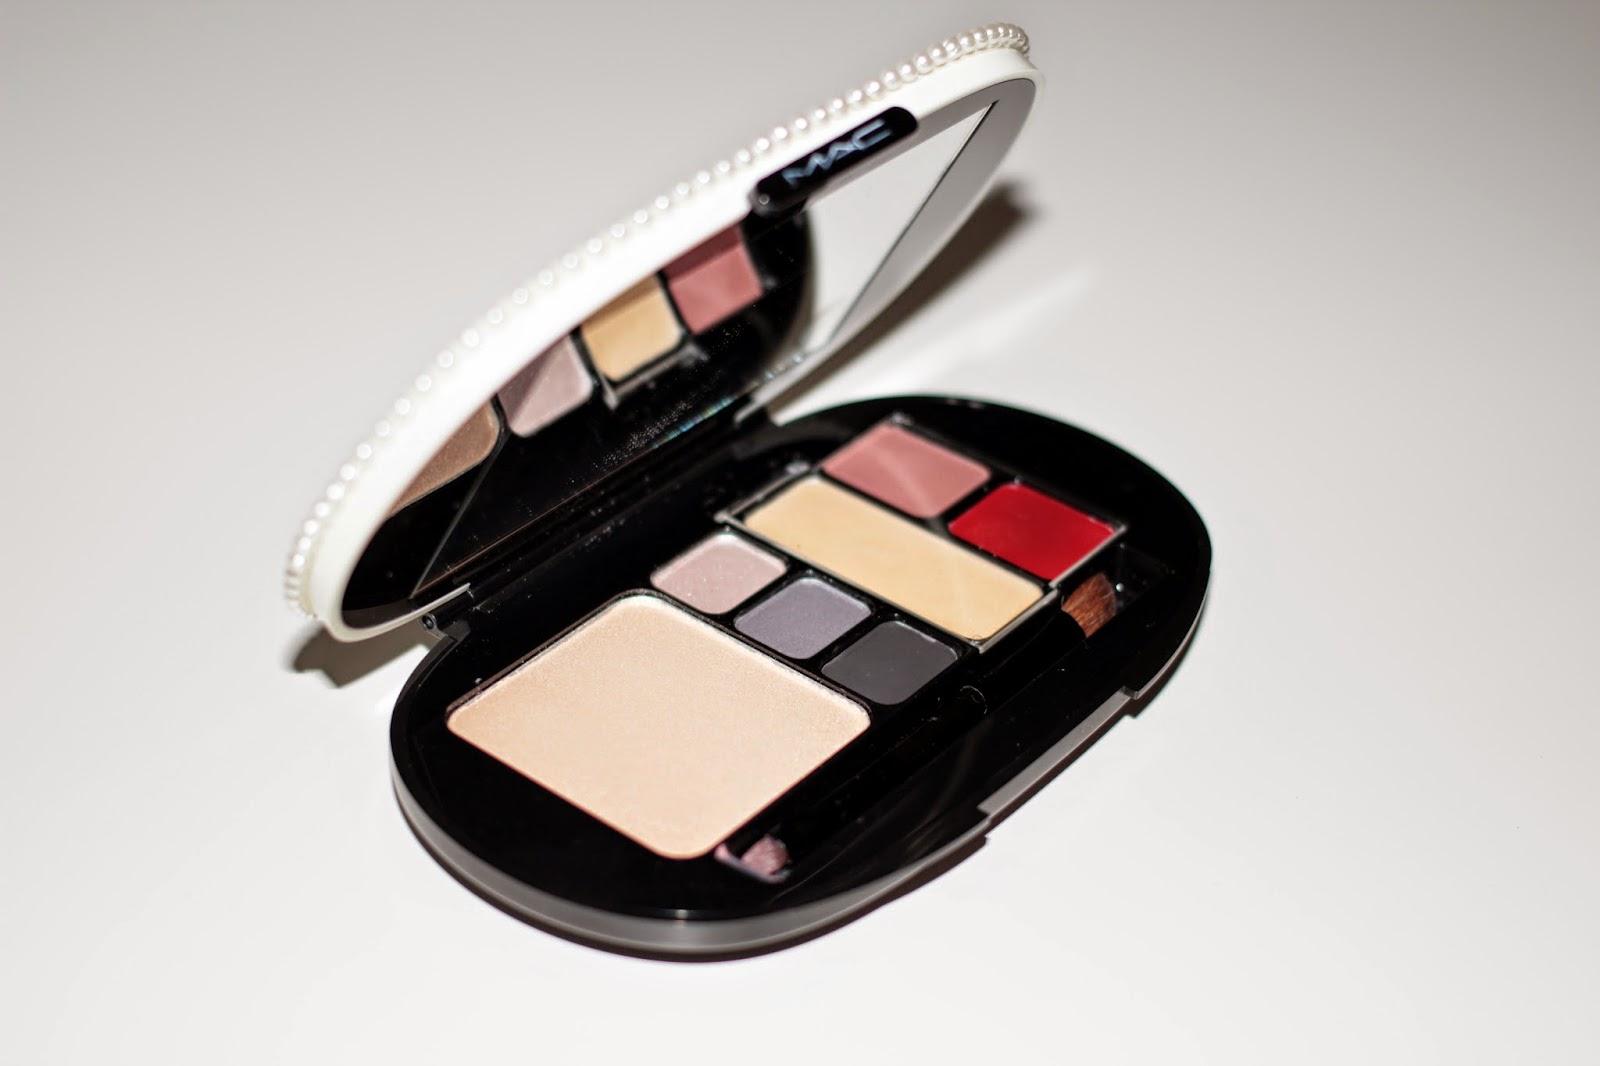 Keepsakes/Smoky face palette MAC, mac cosmetics, mac face palette, palette mac camé, Keepsakes mac, meilleure palette maquillage,